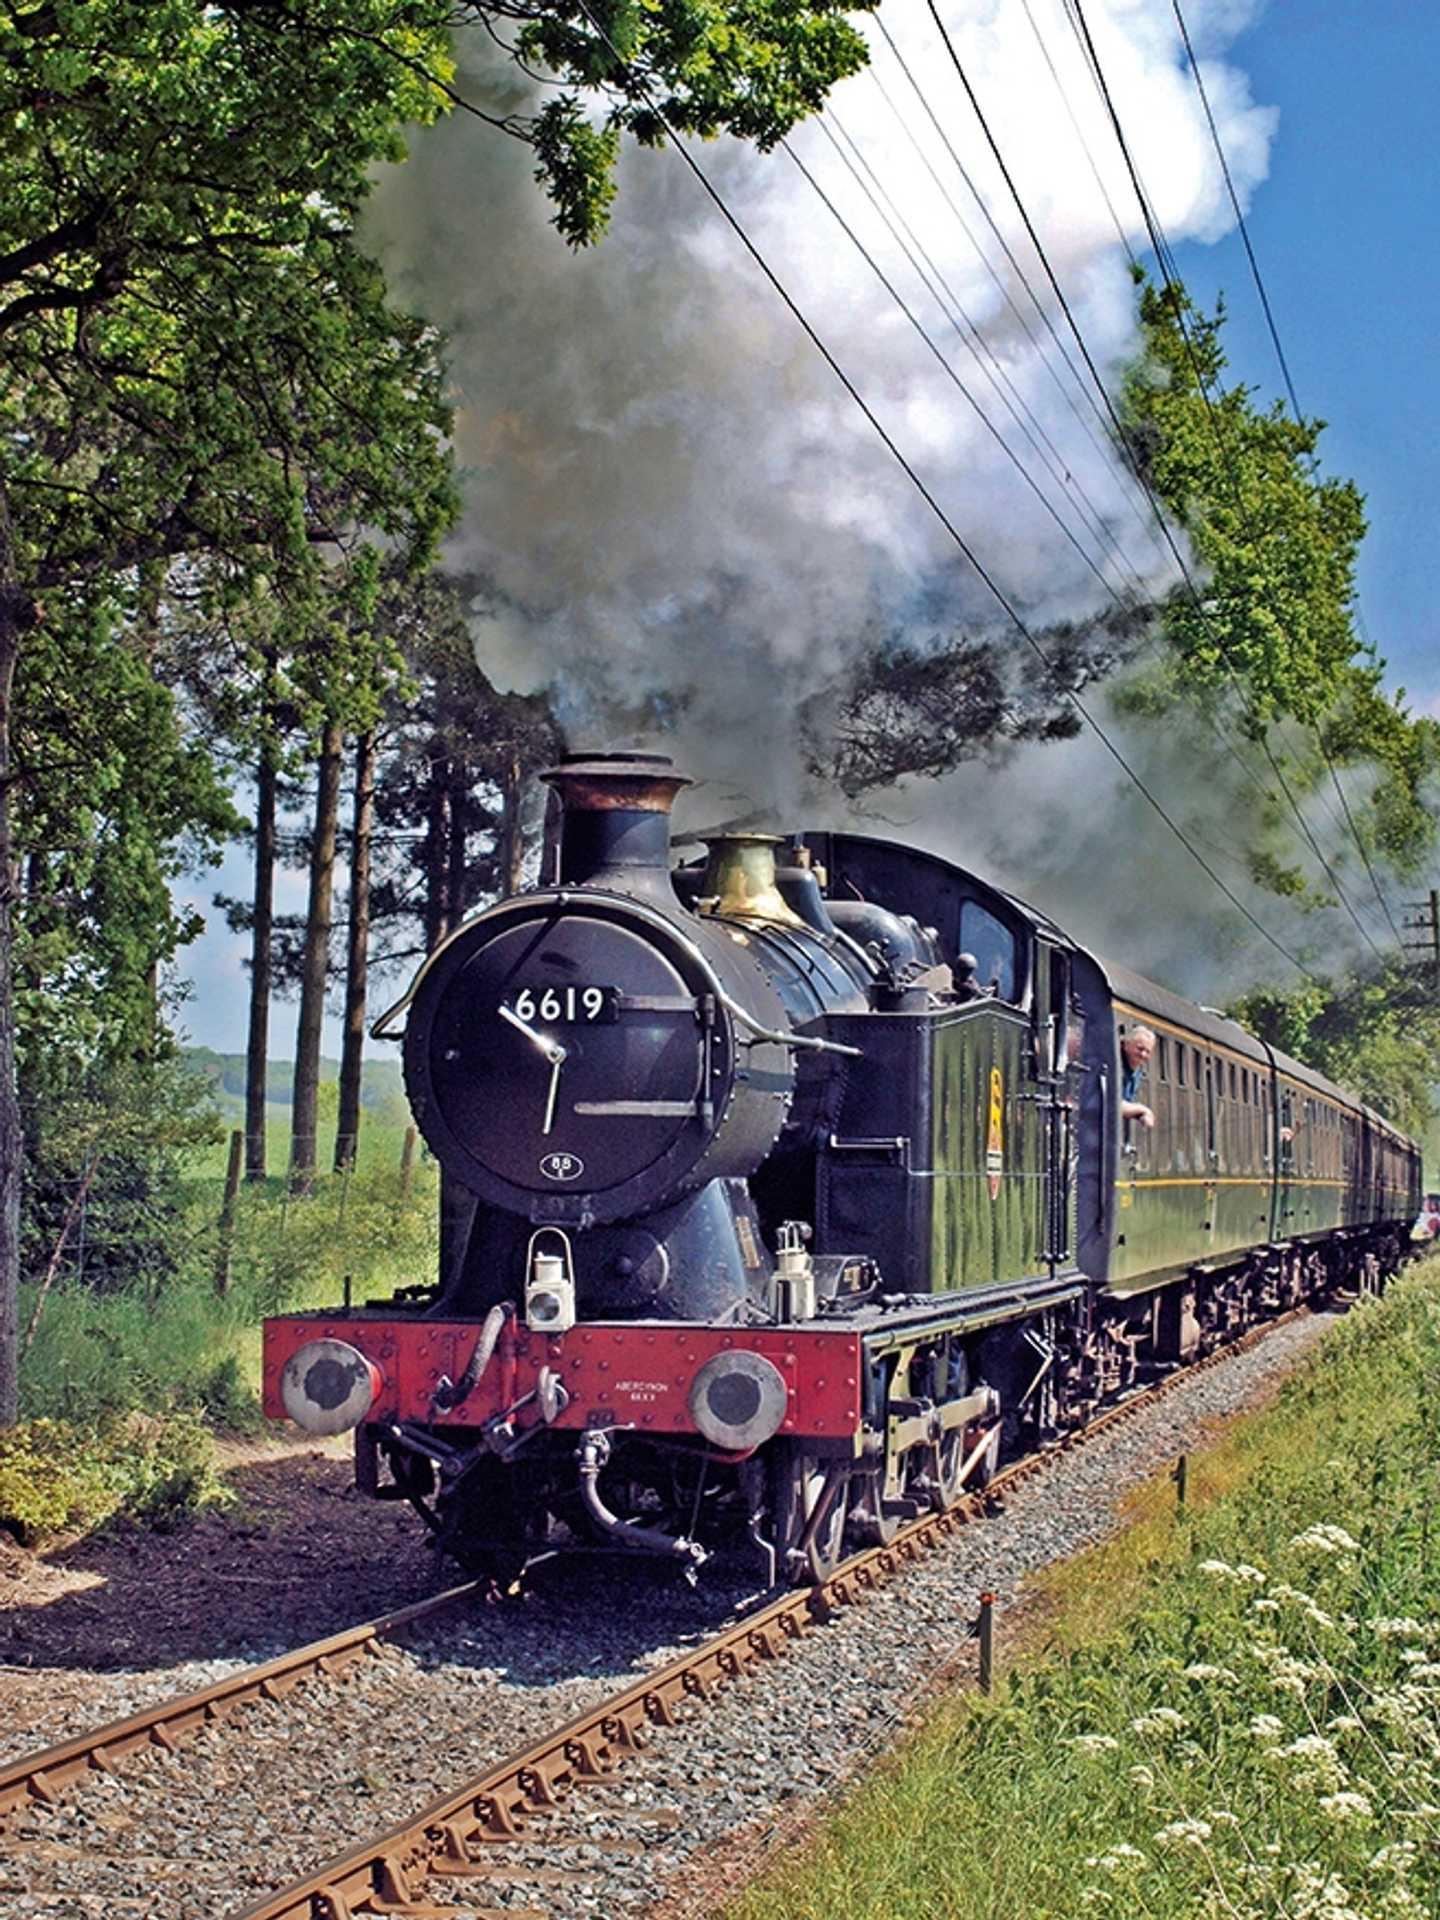 Train on the railway